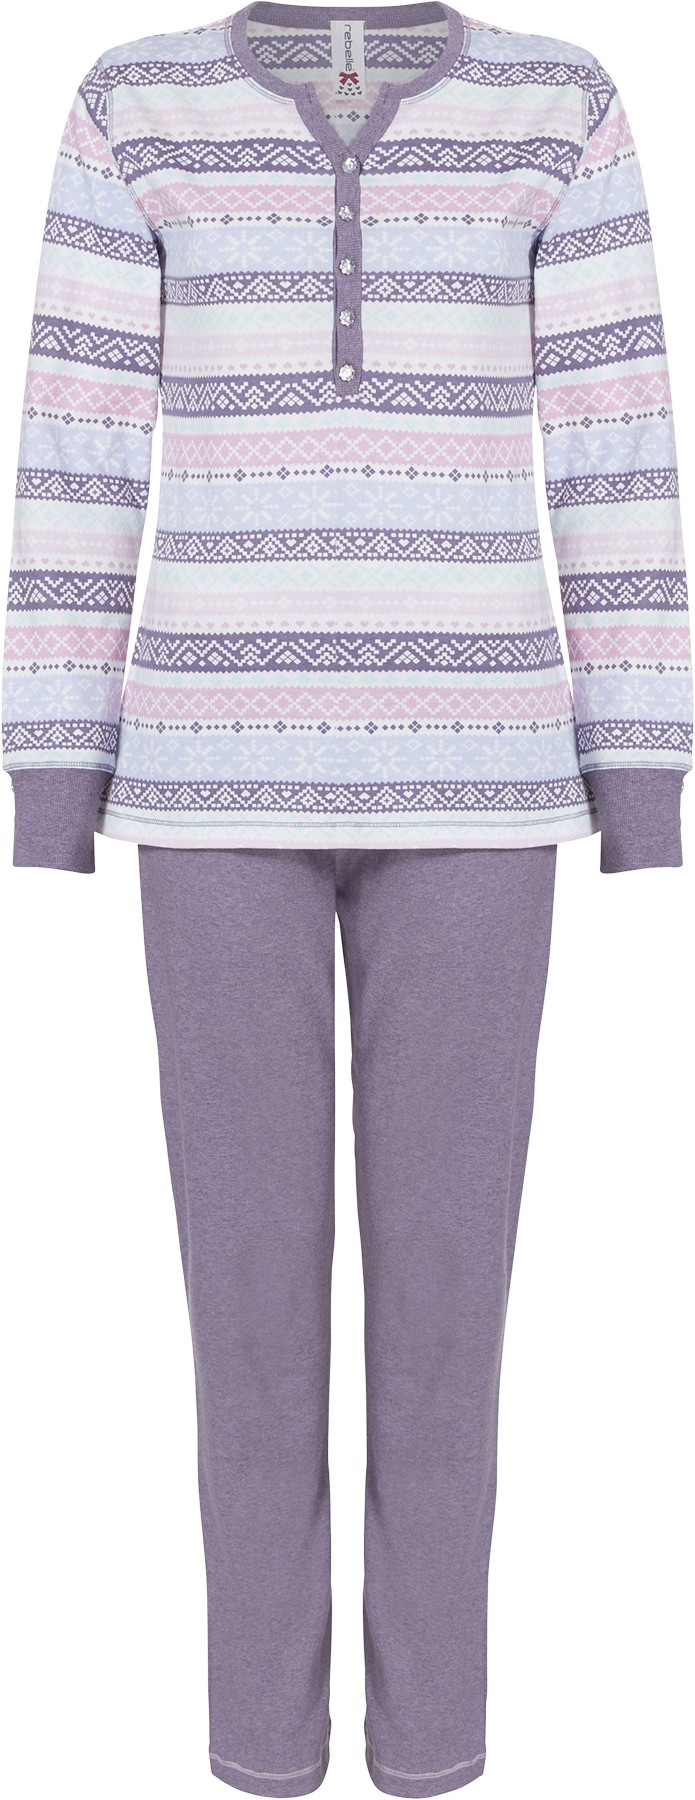 Image of Dames pyjama Rebelle 2172-210-2-36